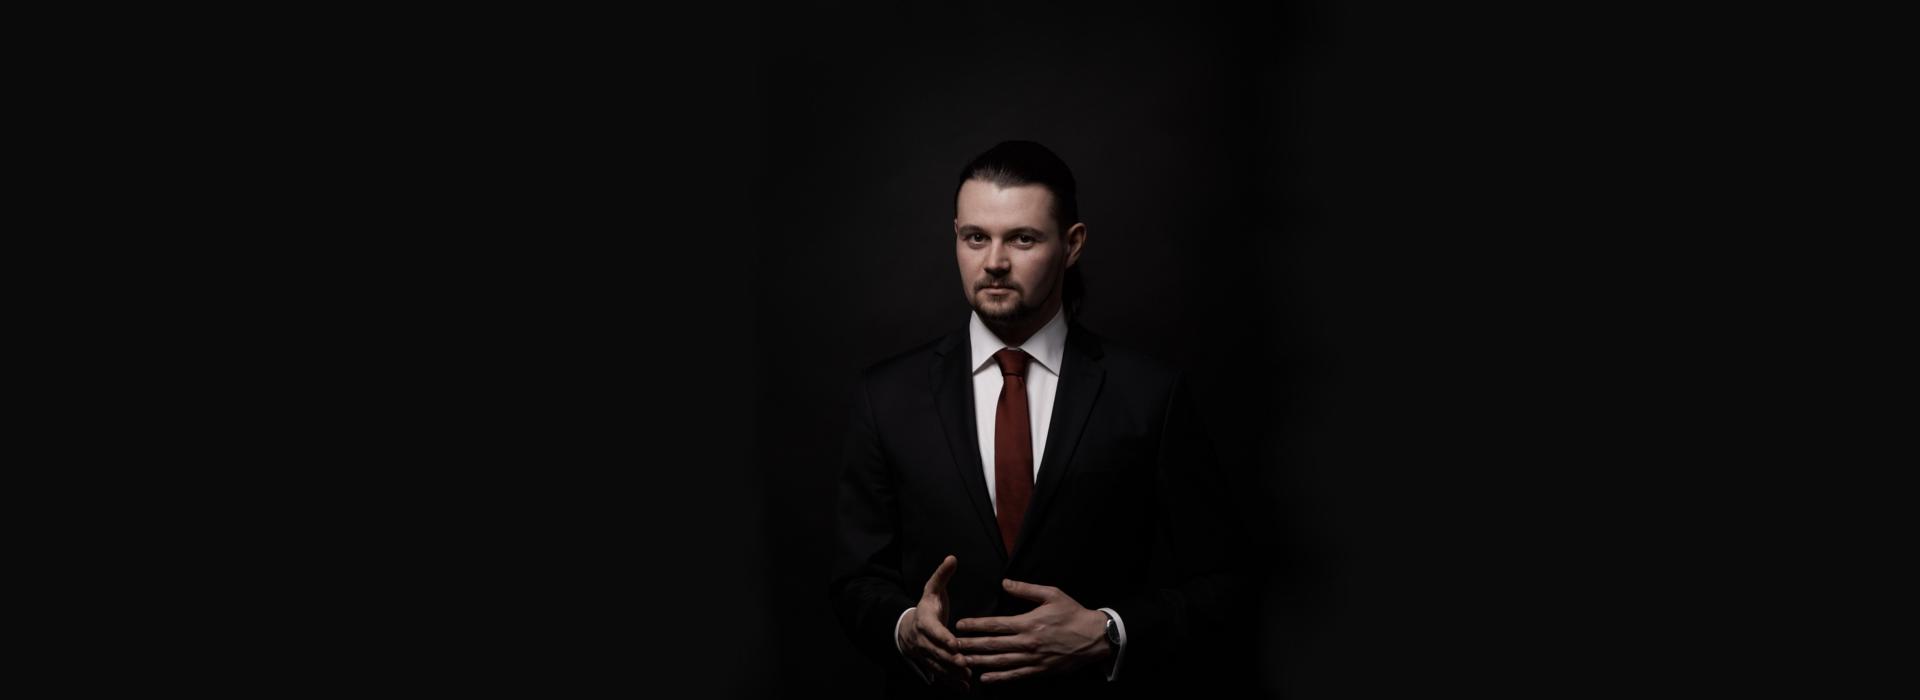 Krzysztof Osiak   Adwokat Siedlce